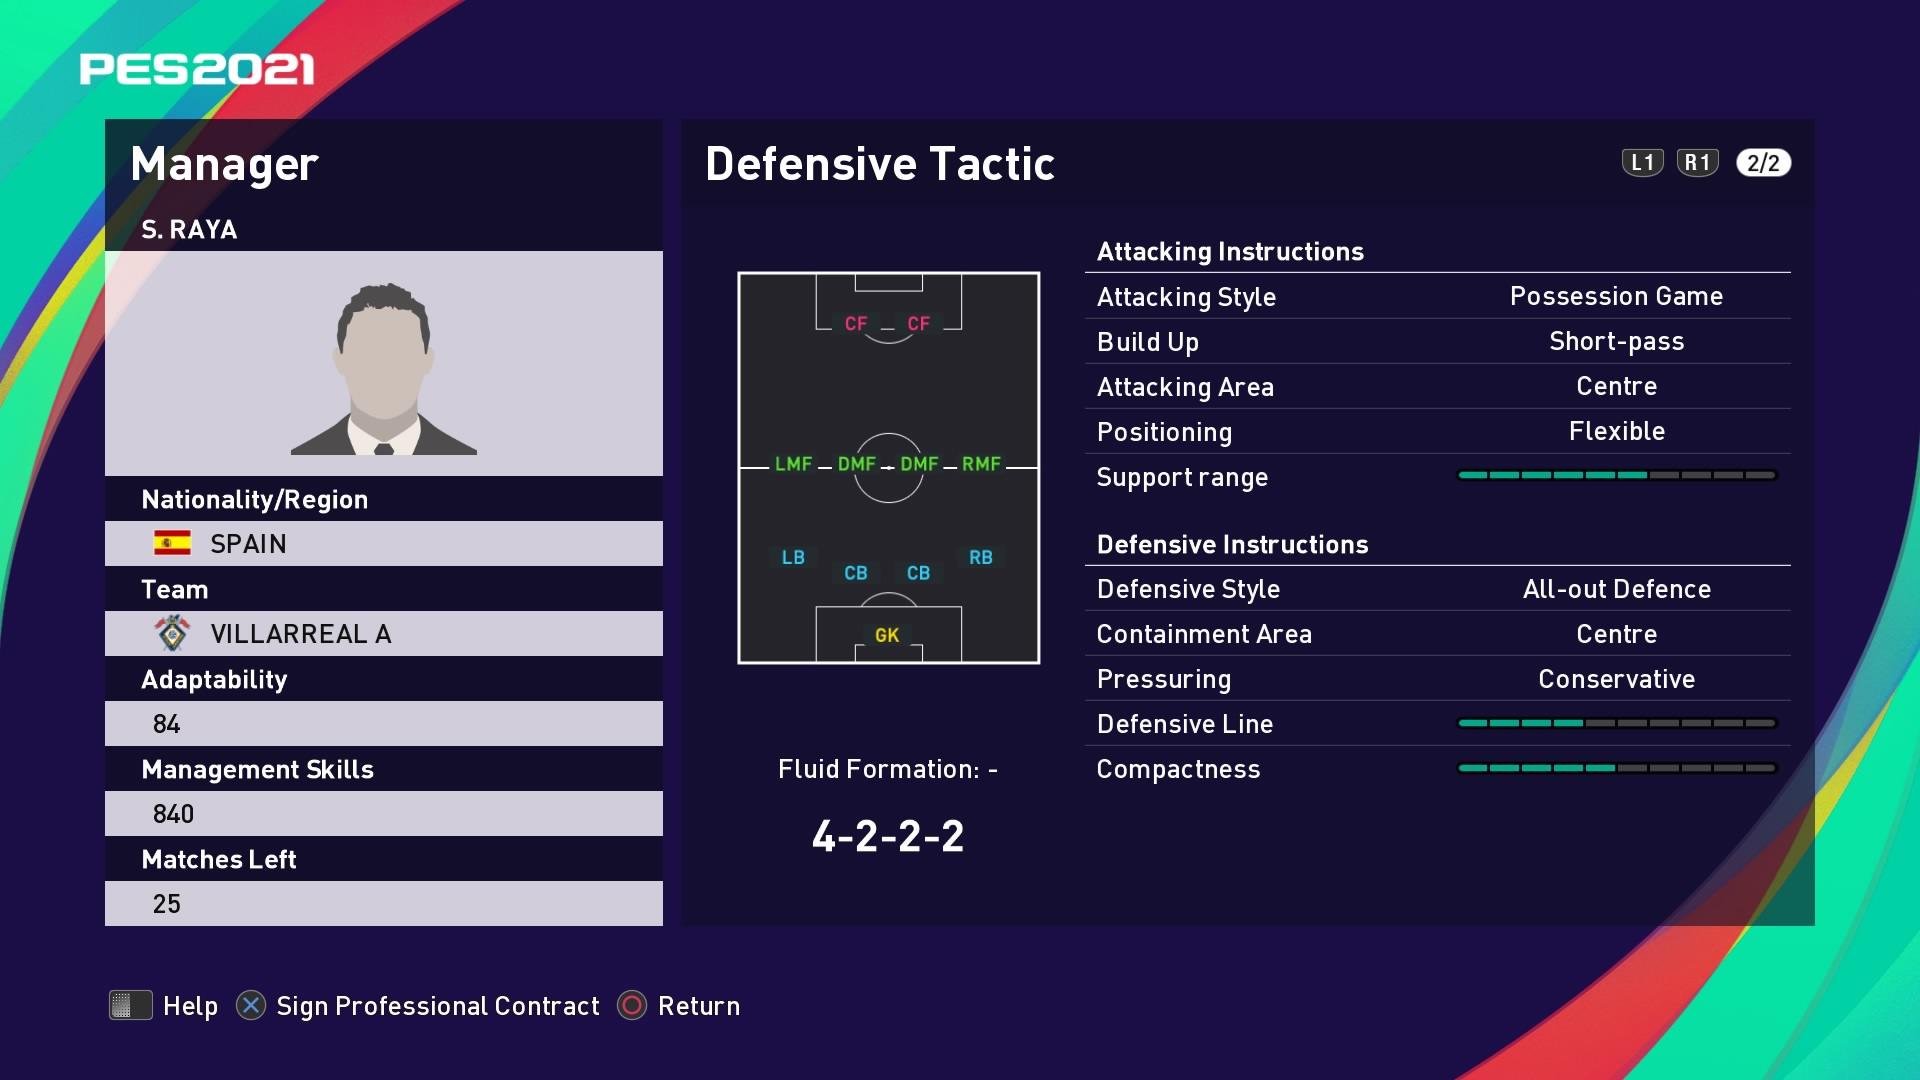 S. Raya (Unai Emery) Defensive Tactic in PES 2021 myClub